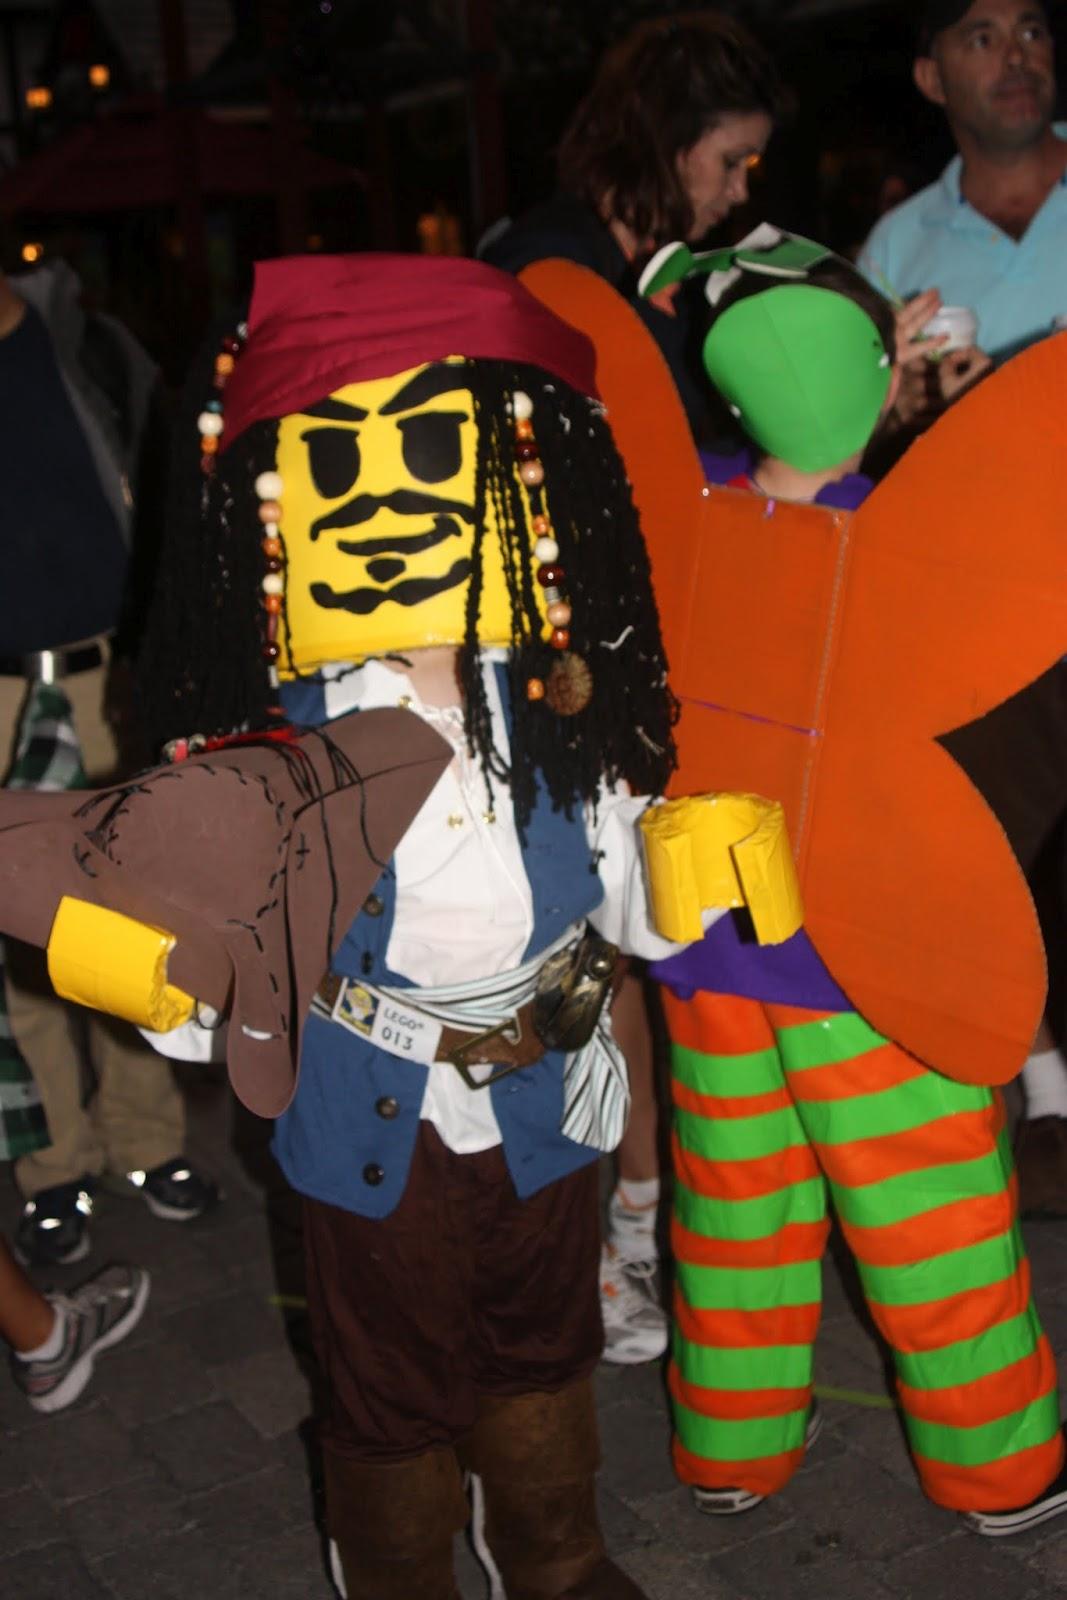 u0027Duct tape manu0027s best friendu0027 or u0027How to make a Lego Jack Sparrow costumeu0027  sc 1 st  Crafty Lady/Working Mom & Crafty Lady/Working Mom: u0027Duct tape: manu0027s best friendu0027 or u0027How to ...